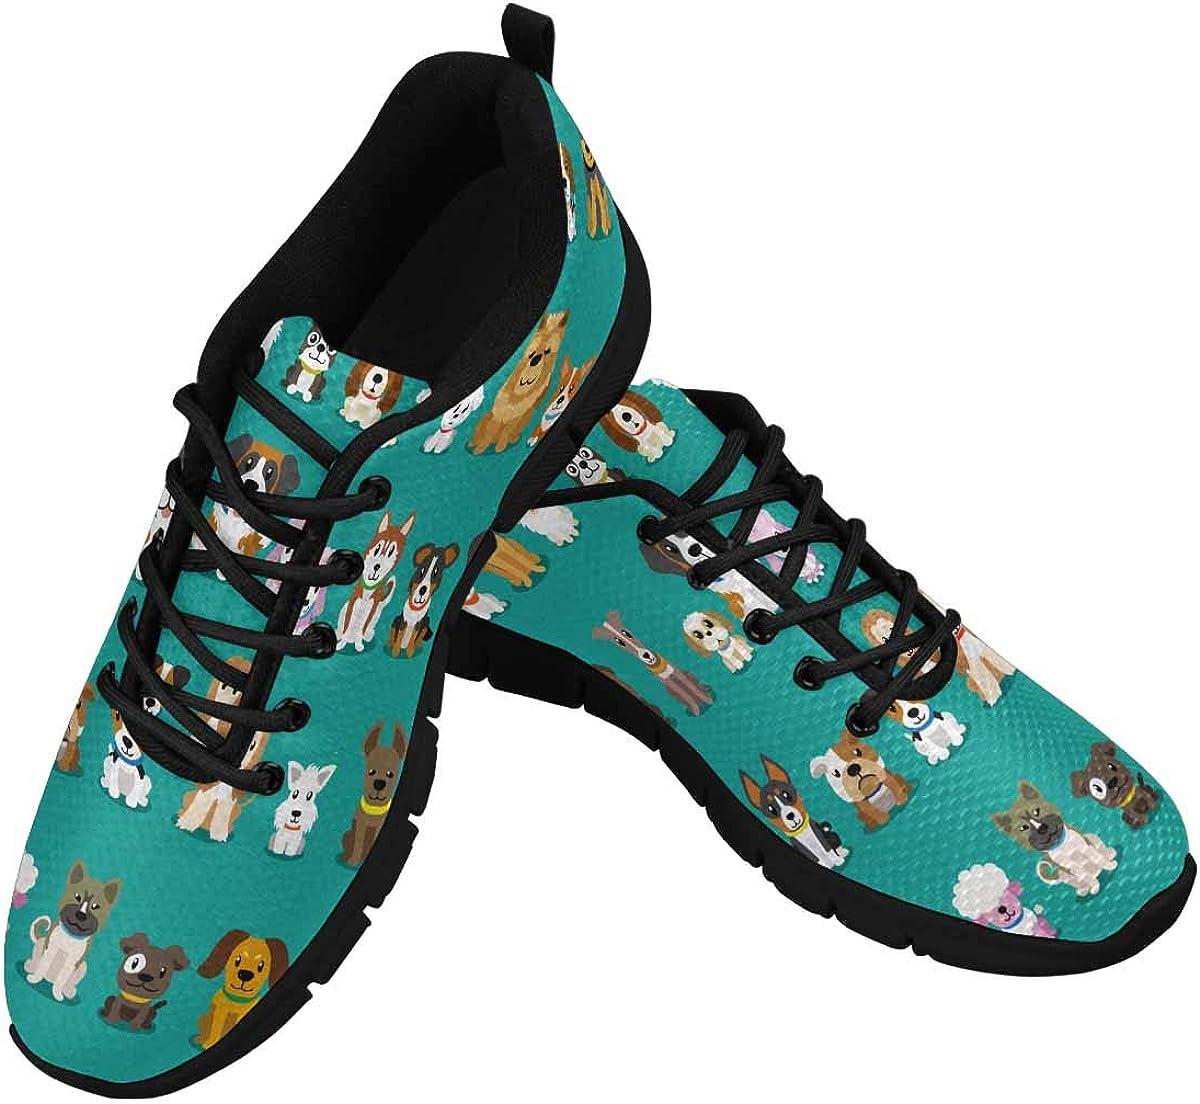 INTERESTPRINT Different Type of Cartoon Dogs Women Walking Shoes Comfortable Lightweight Work Casual Travel Sneakers